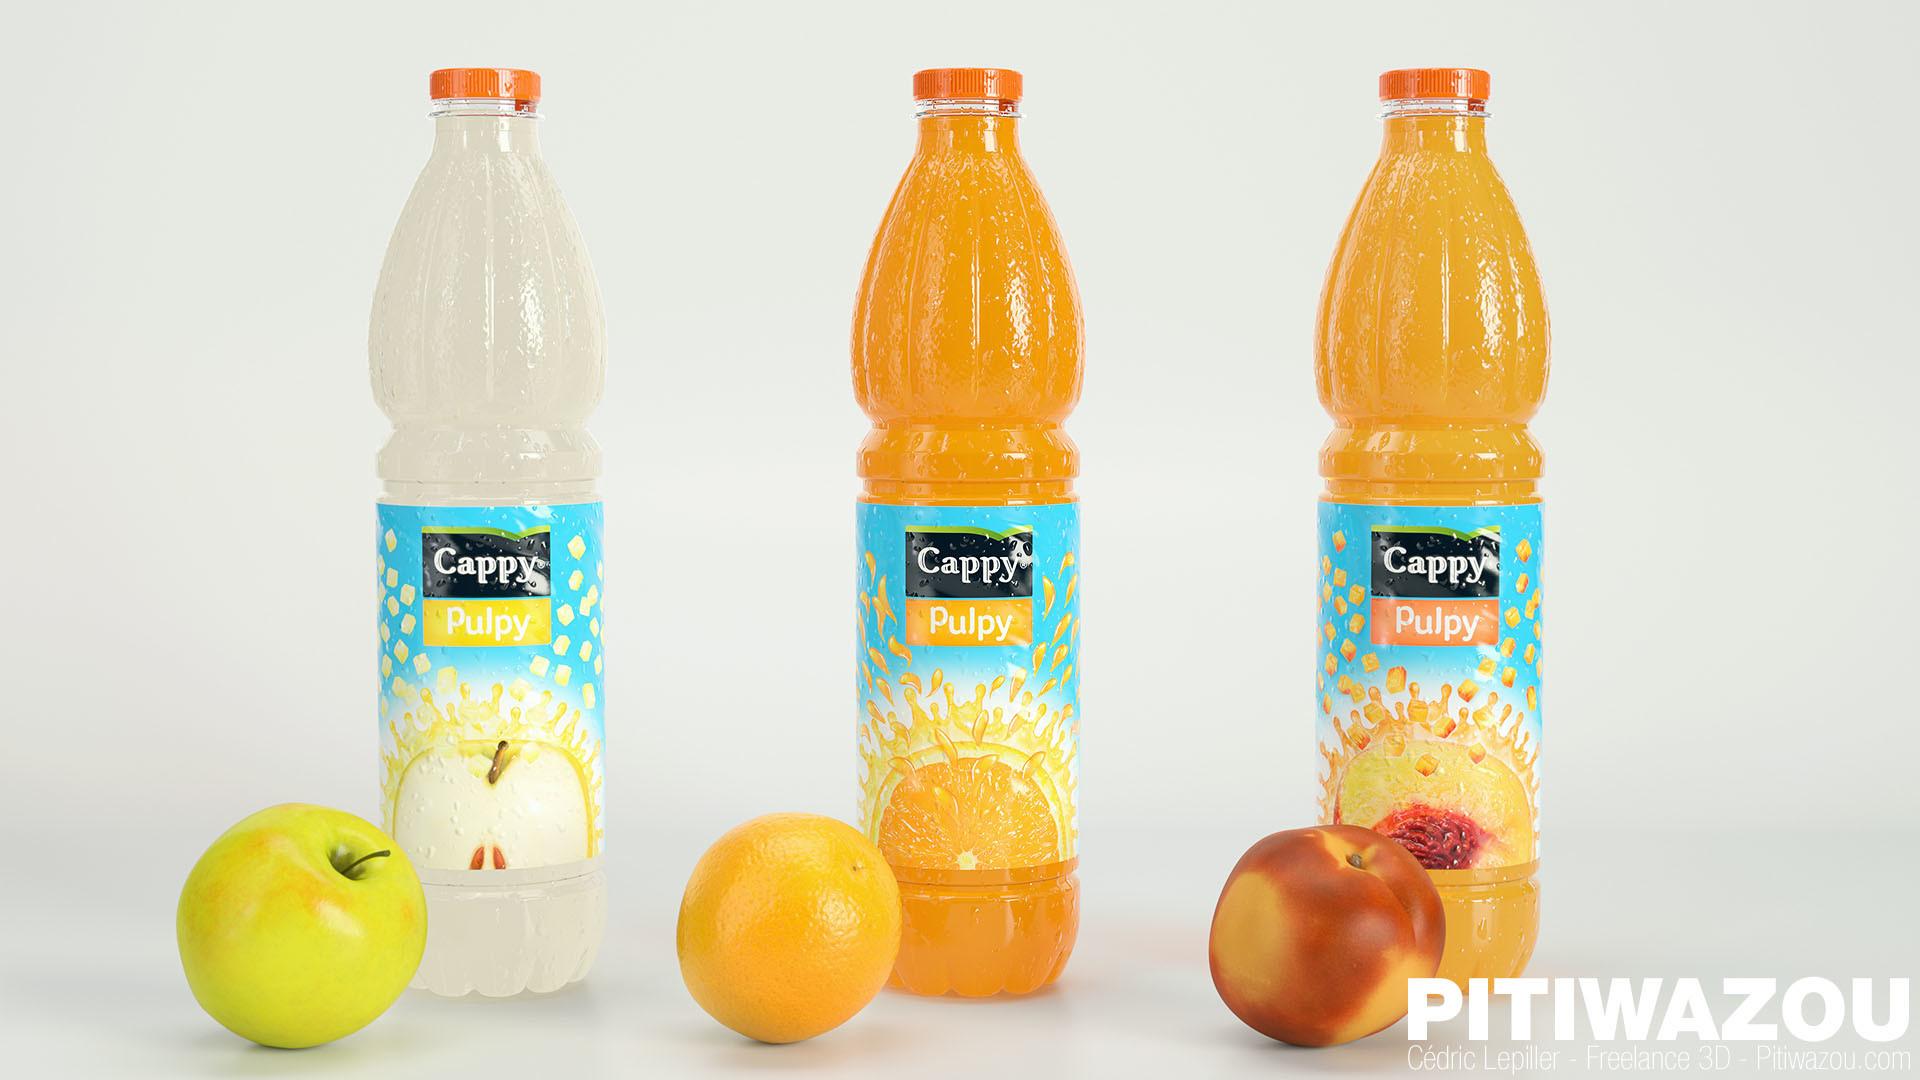 Cedric lepiller cedric lepiller pitiwazou pulpy 3 bouteilles 001